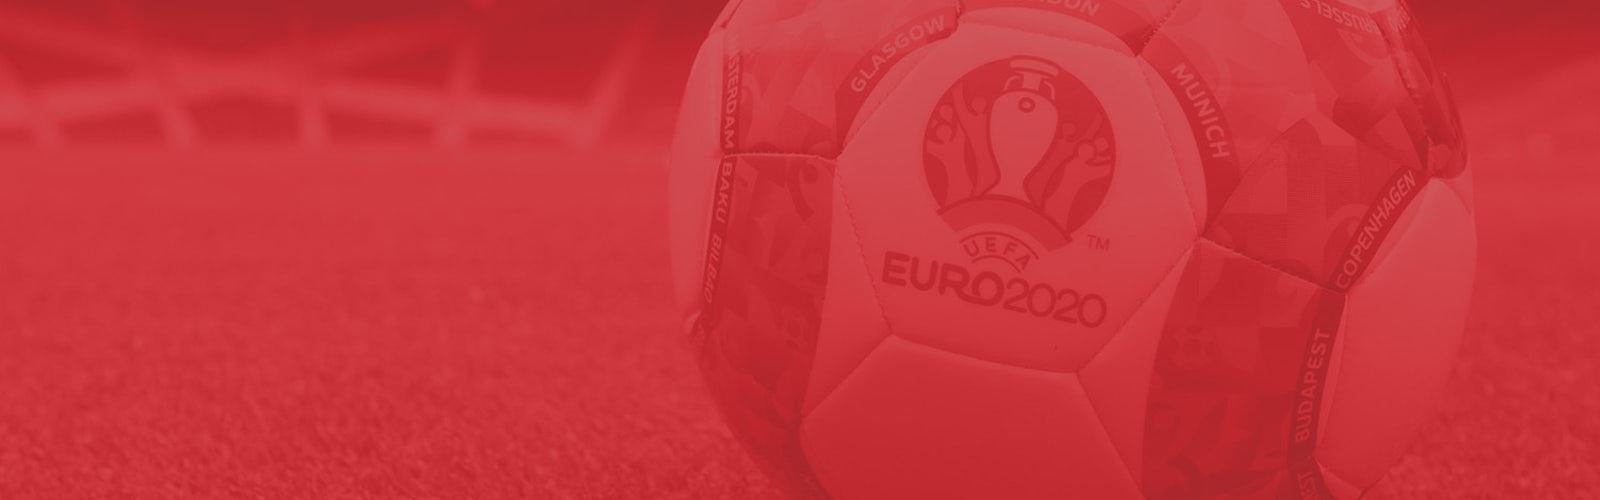 Euros 2021 header image